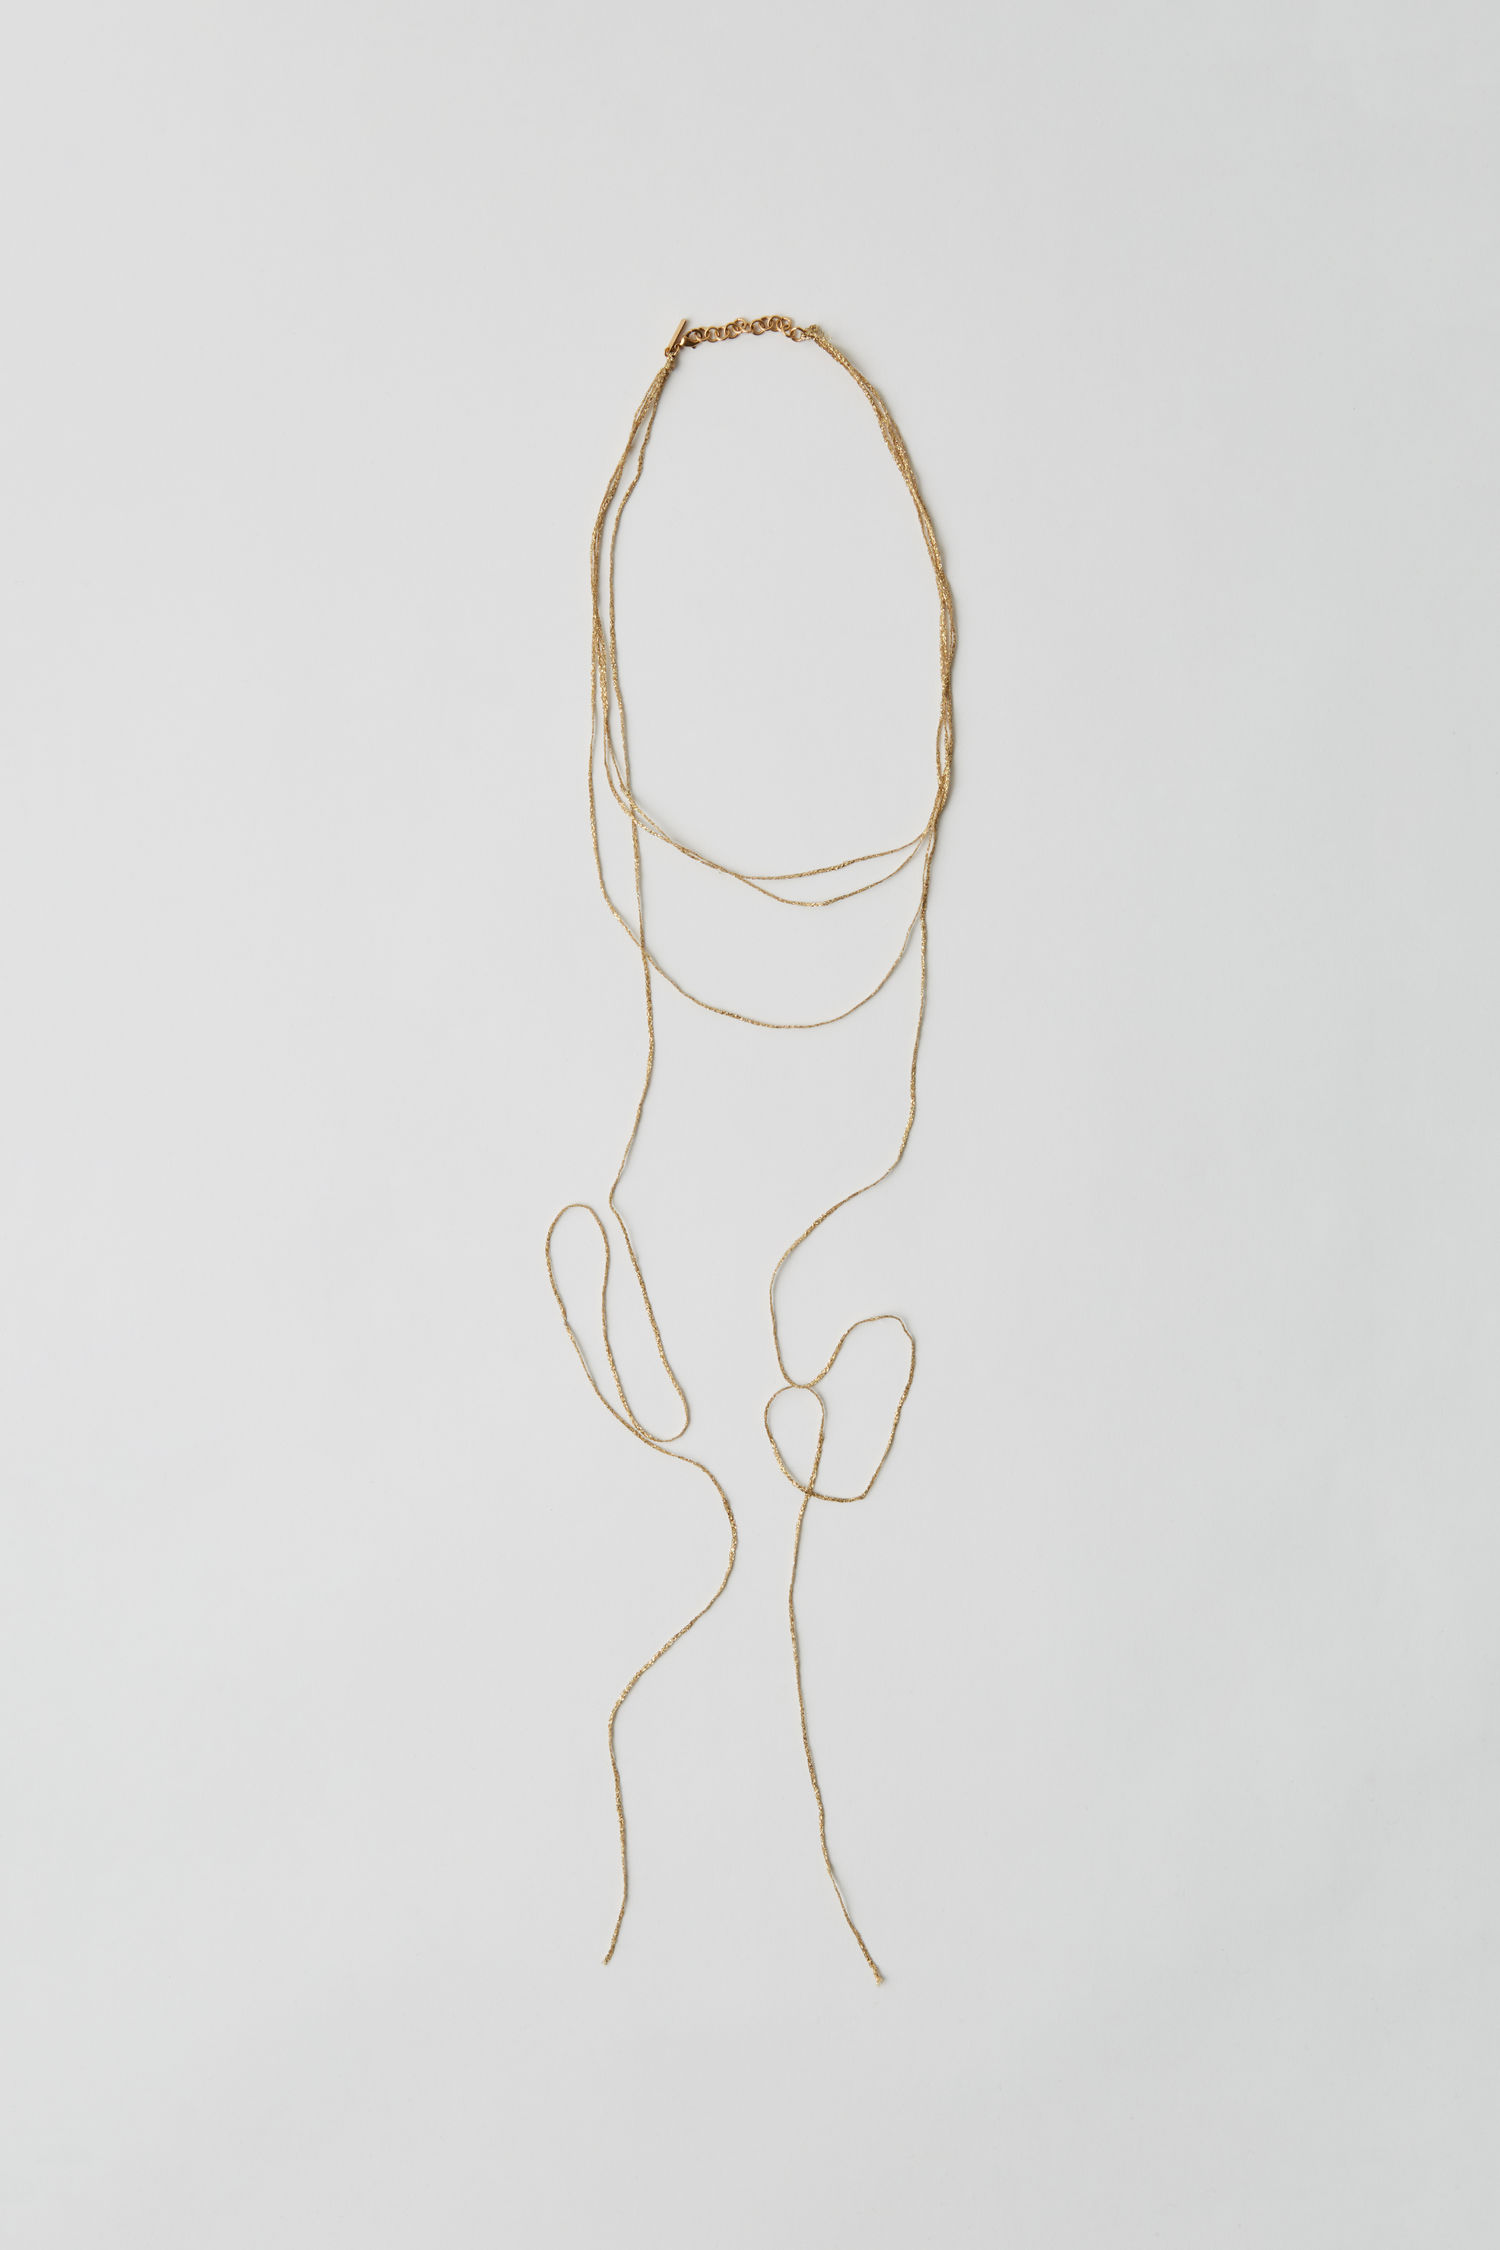 Crochet necklace gold